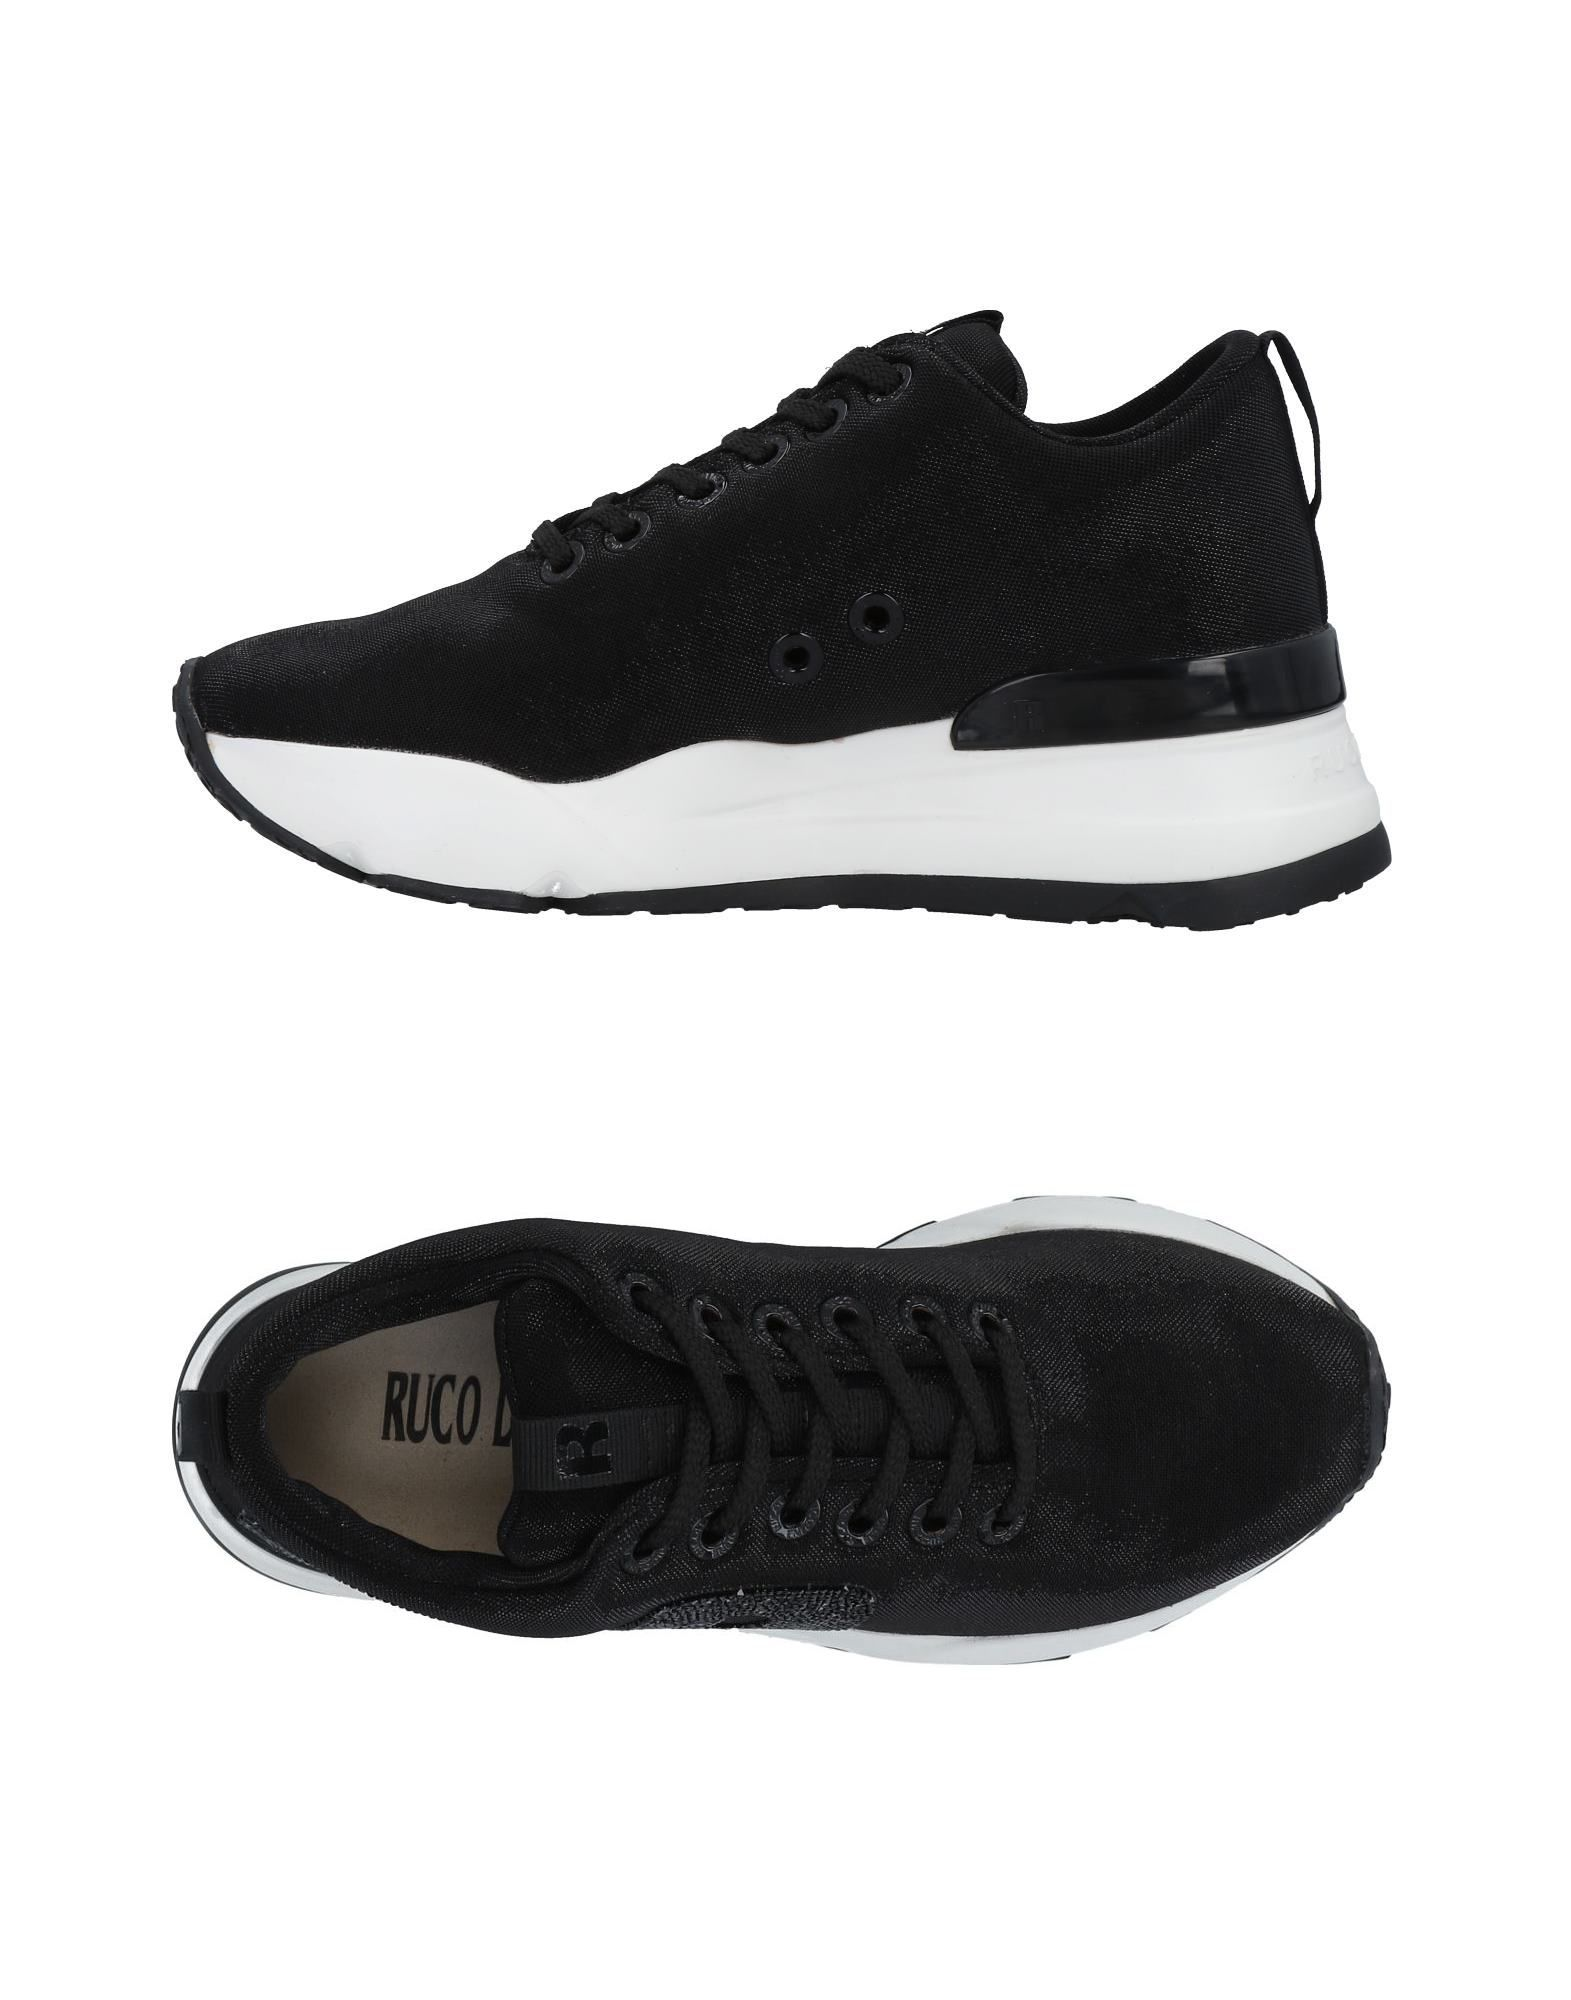 Stilvolle billige Damen Schuhe Ruco Line Sneakers Damen billige  11478632JA 12cd7f